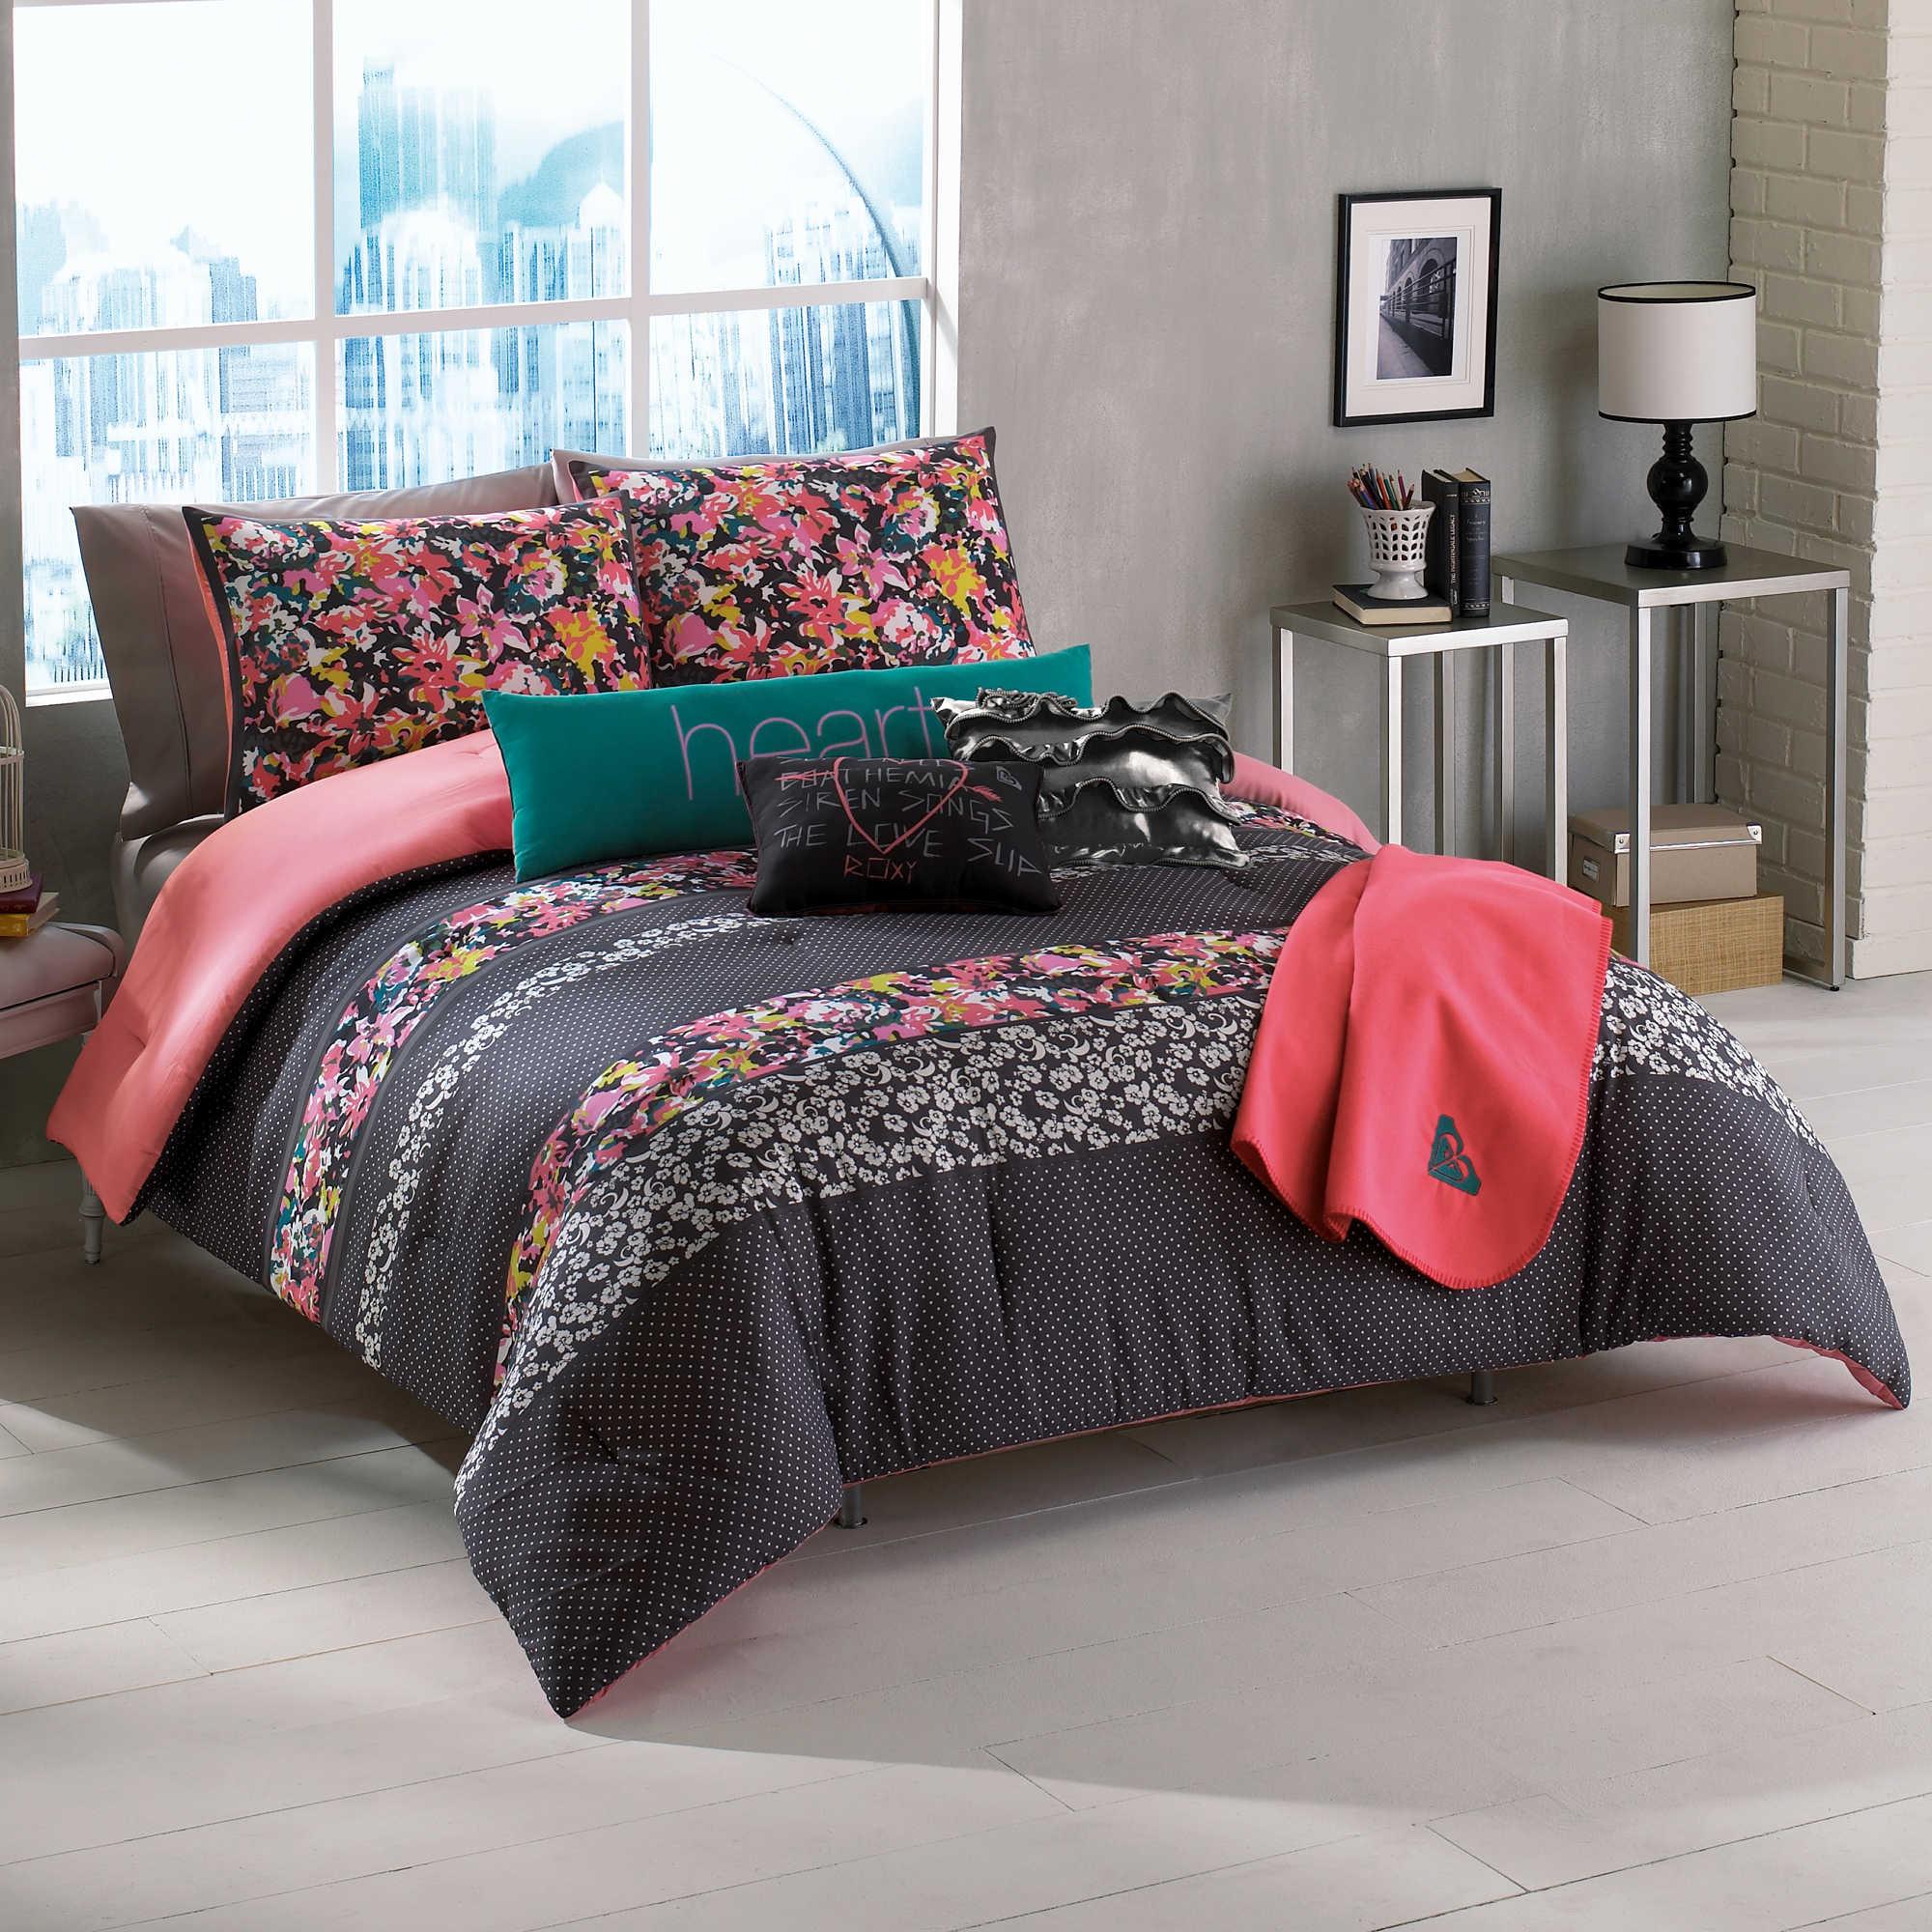 Fun Bed Sheets Ideas | HomesFeed